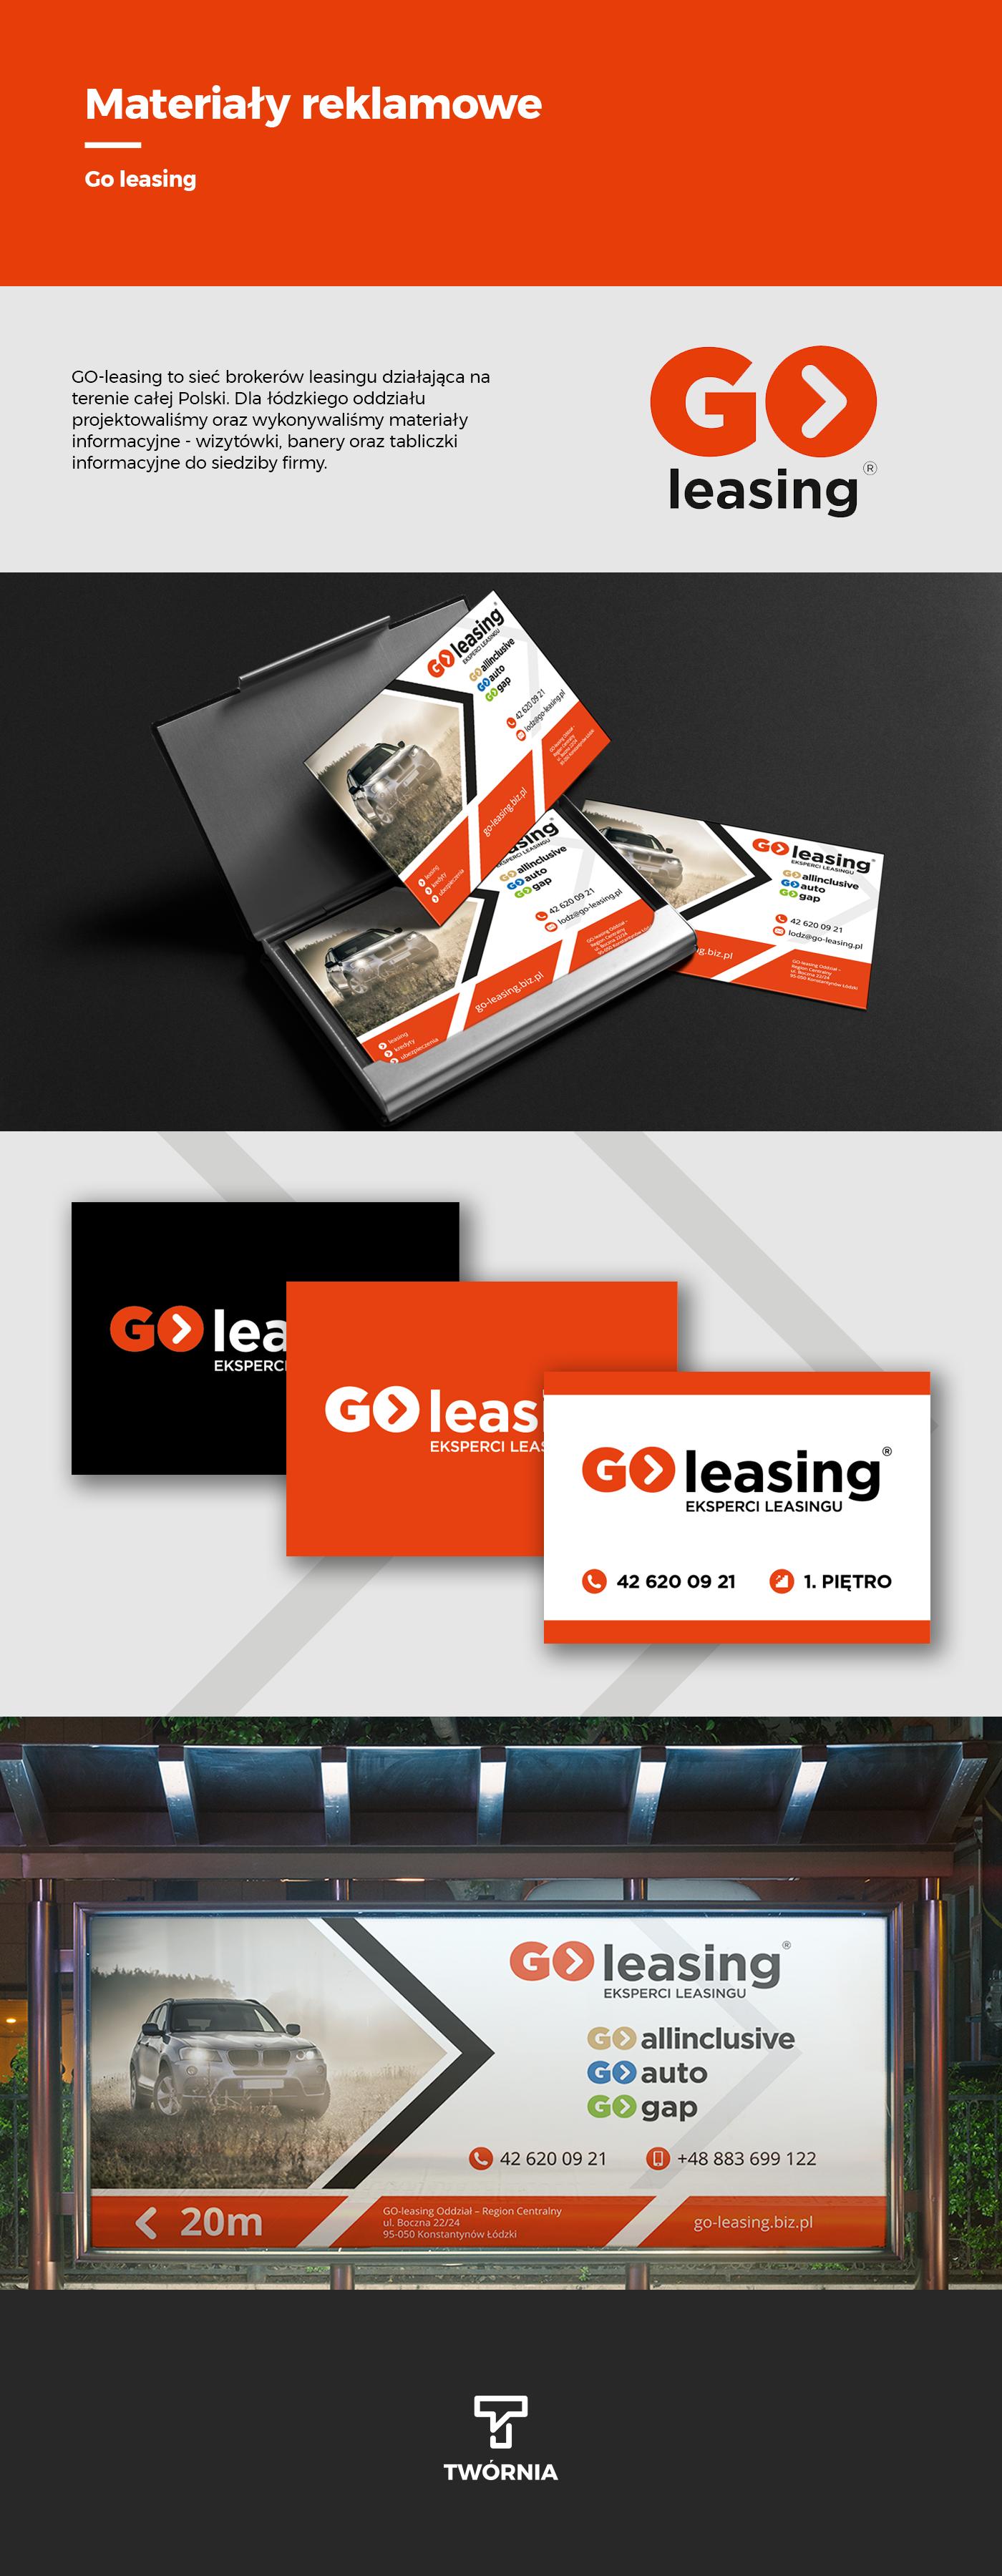 reklama,materiały reklamowe,wizytówka,baner,branding ,advertisin material,business card,banner